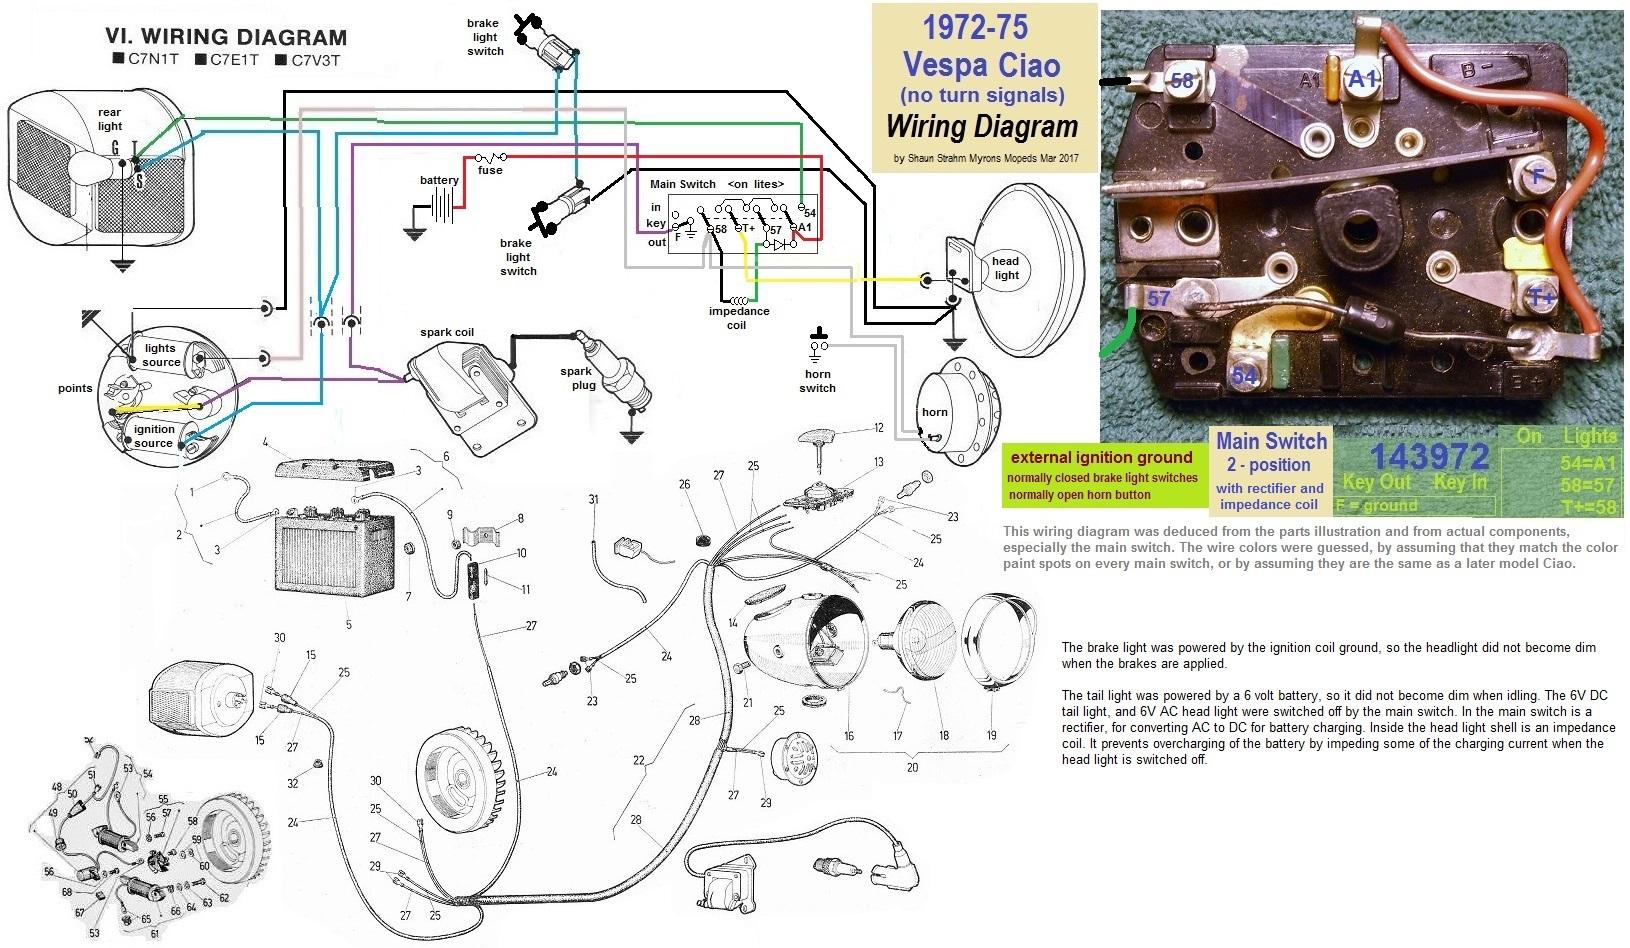 Pleasing Vespa P125X Wiring Diagram Vespa Ciao Vespa Sprint Vespa Super Wiring Cloud Nuvitbieswglorg